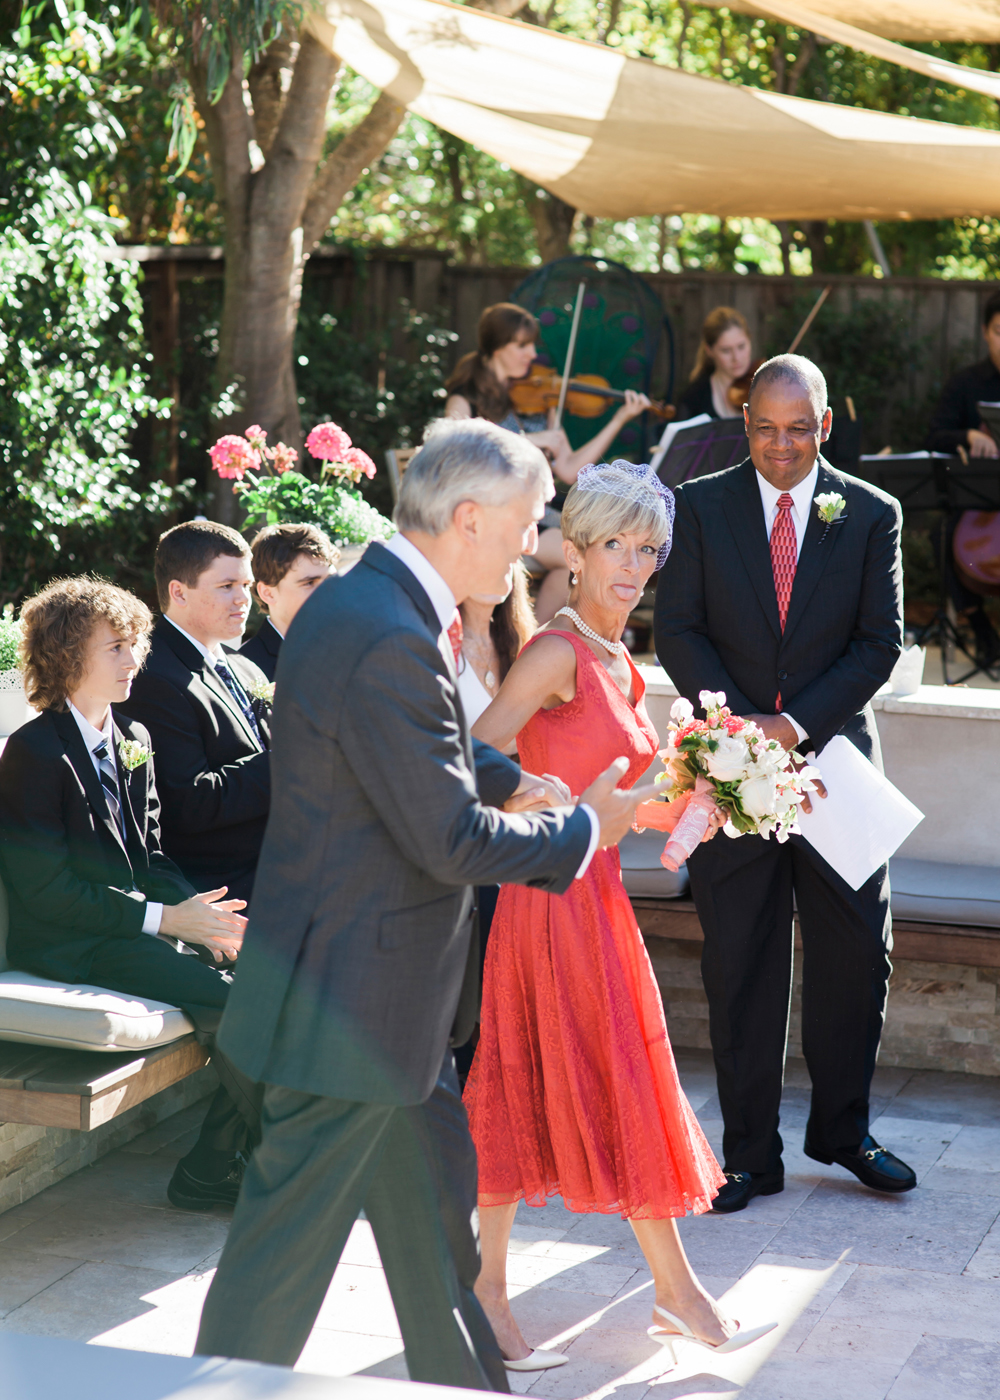 menlo-park-private-estate-wedding-photography-lilouette-47.jpg